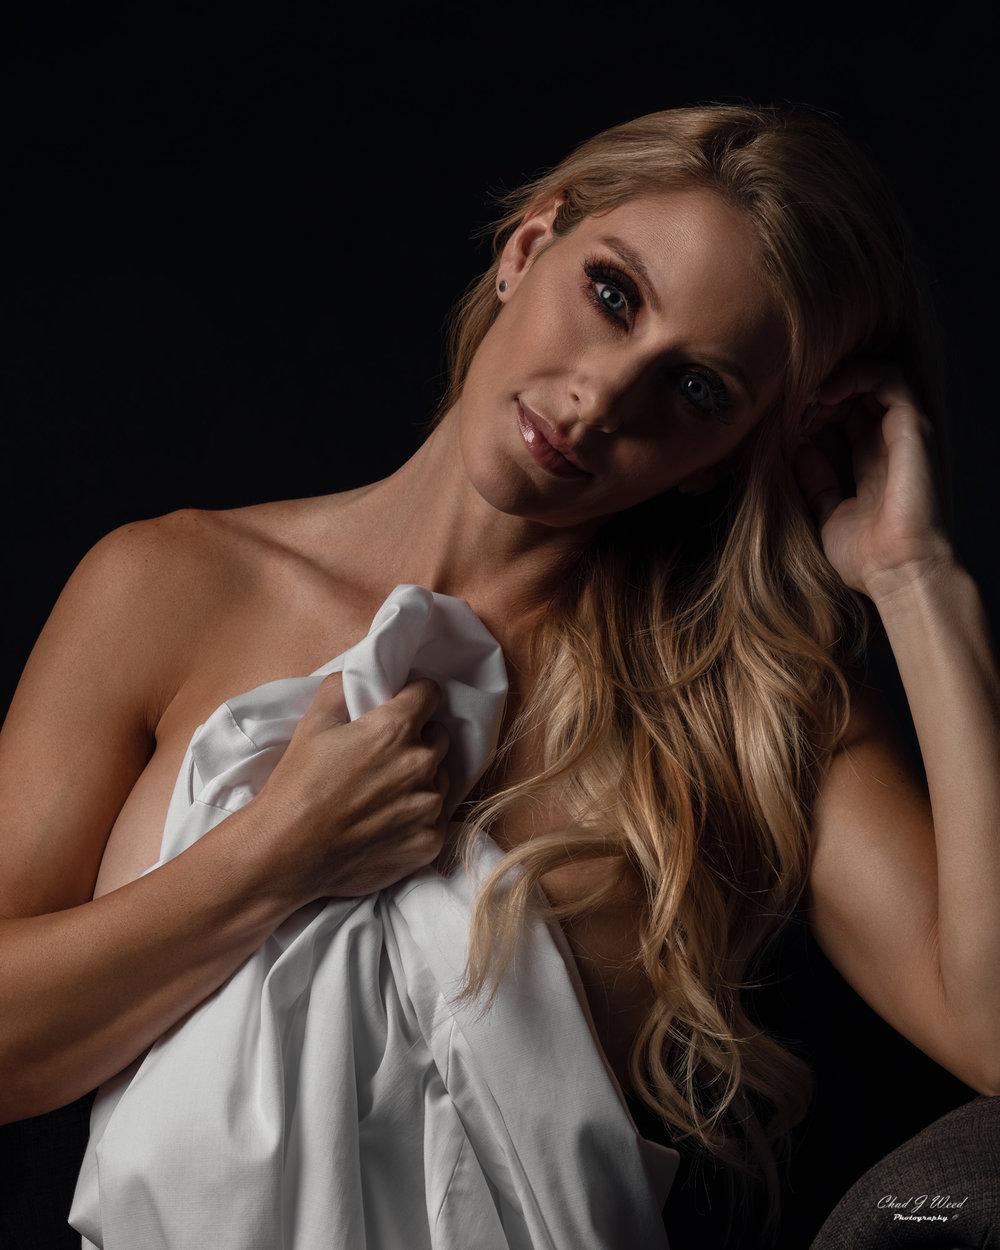 Arizona Fashion Portrait Photographer Chad Weed - Fitness Model Kristi